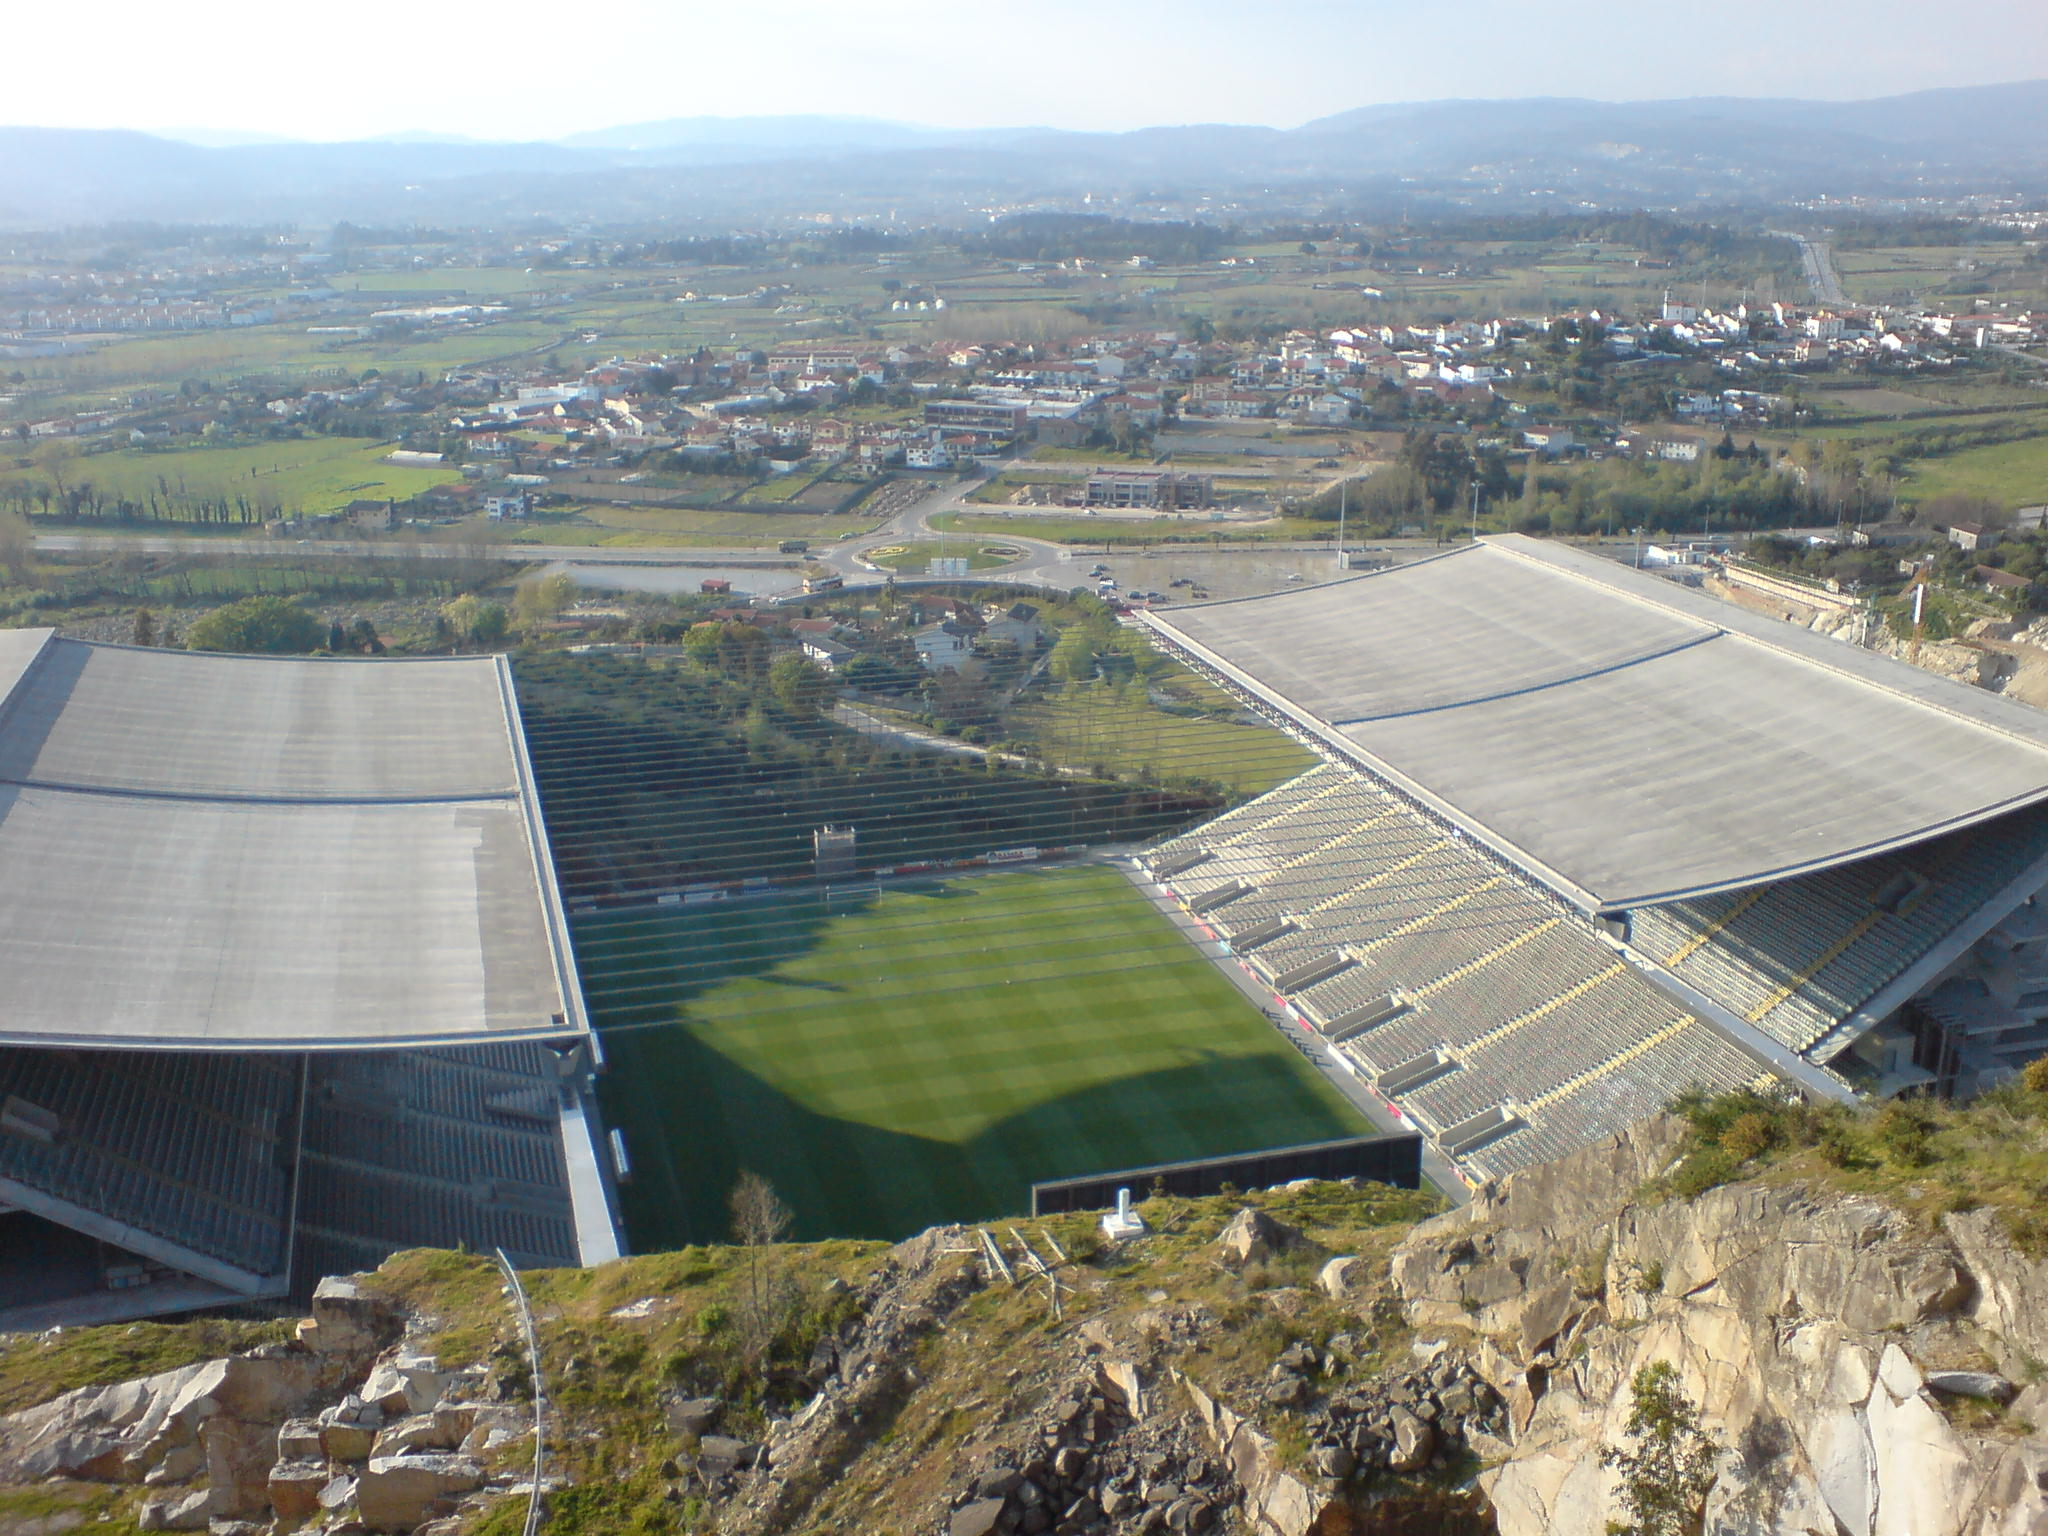 https://upload.wikimedia.org/wikipedia/commons/7/77/Eduardo_Souto_de_Moura_-_Braga_Stadium_02_%286010593292%29.jpg